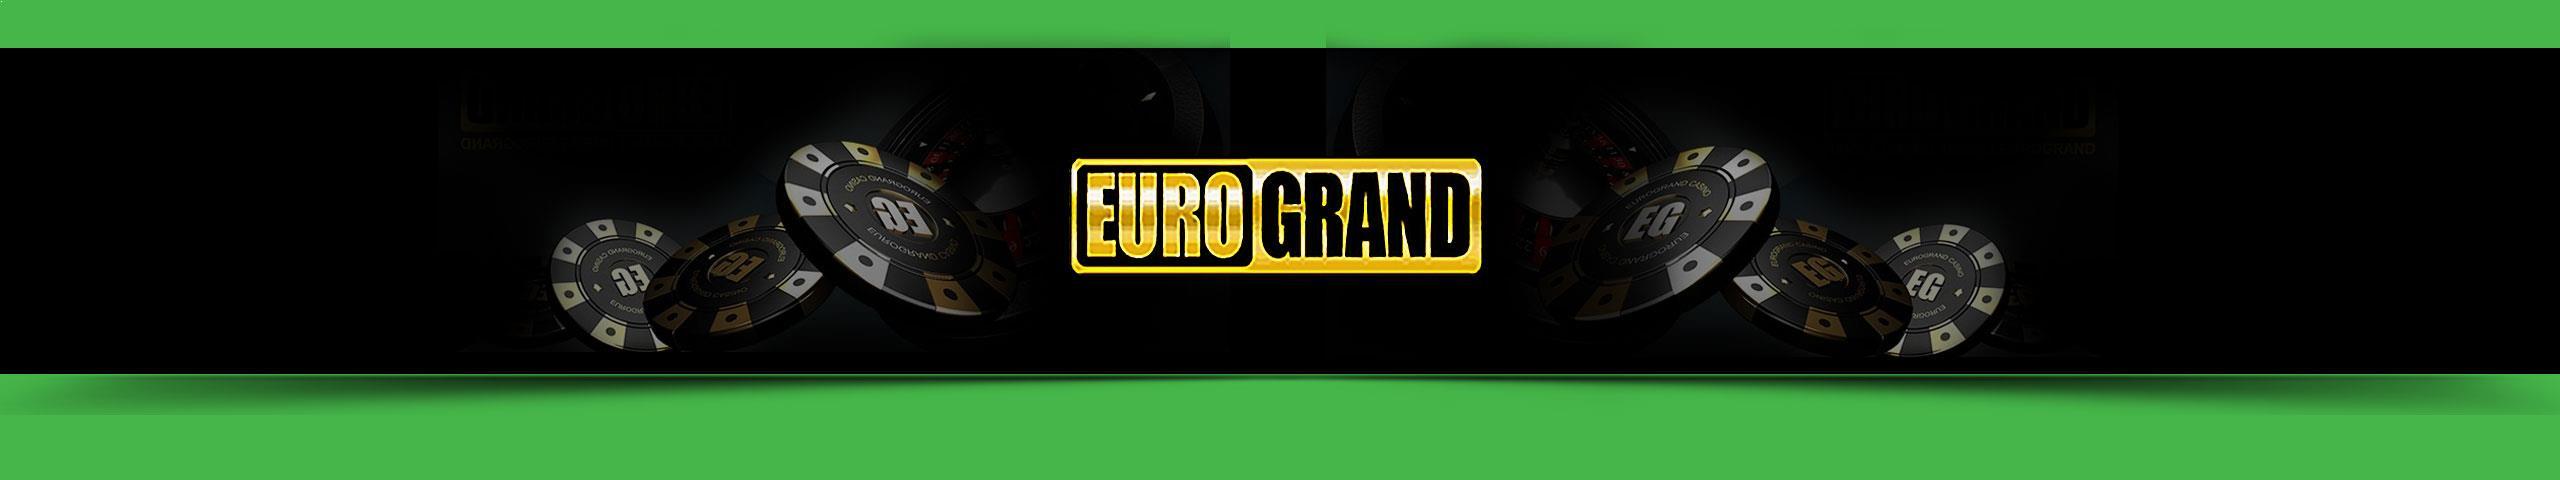 eurogrand casino Vizualizarea Casino-ului Multa Bafta multabafta slider